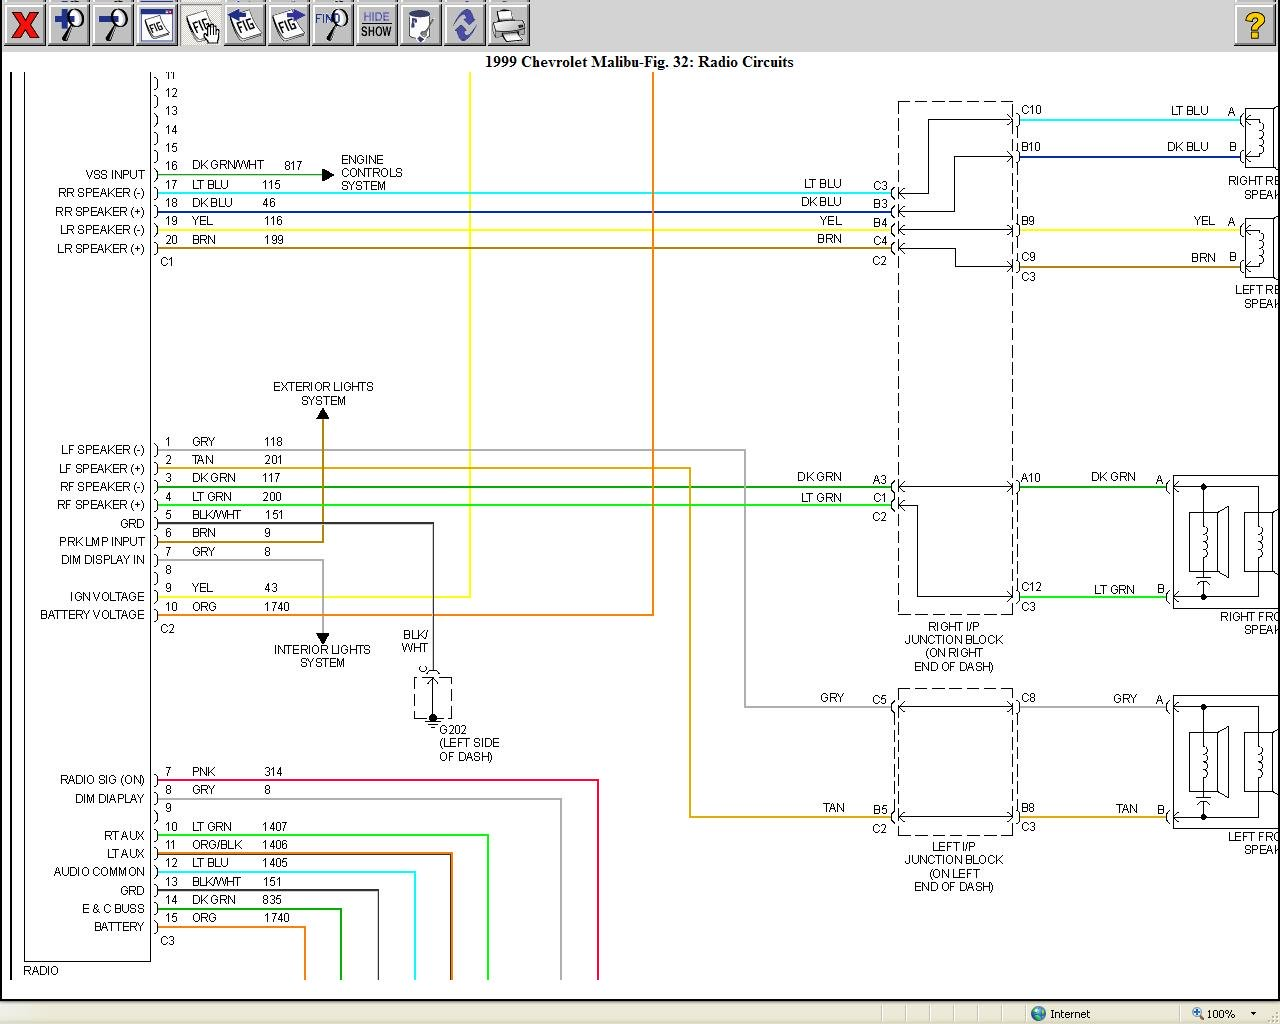 2010 chevy silverado radio wiring diagram 2010 chevy malibu radio wiring diagram bandung bali tintenglueck de  2010 chevy malibu radio wiring diagram